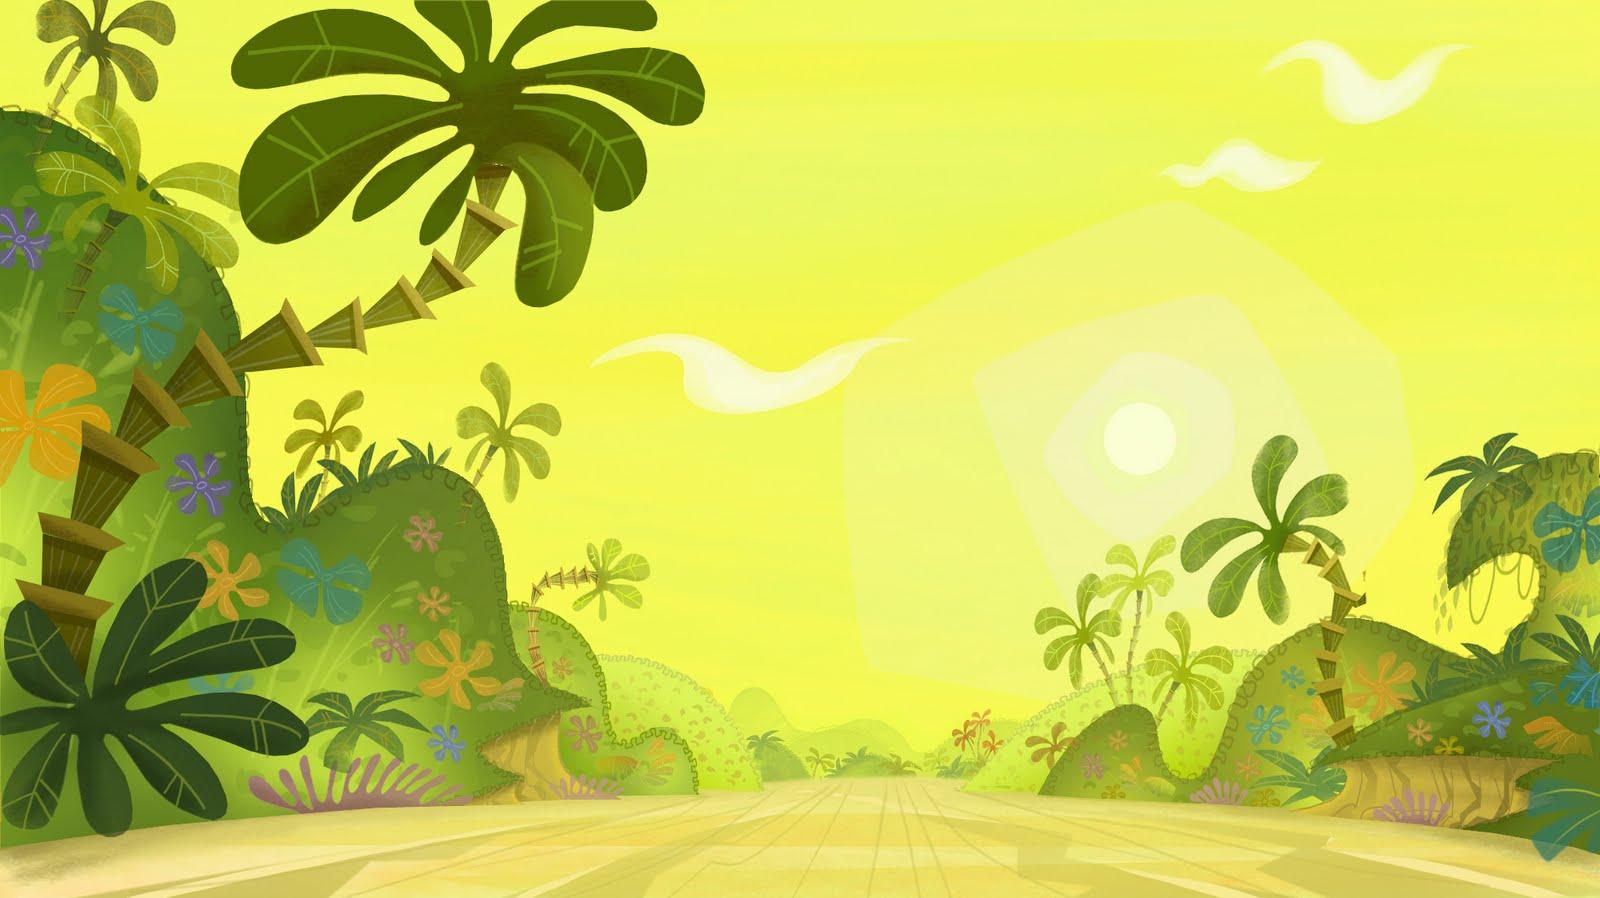 safari cartoon wallpaper - photo #23